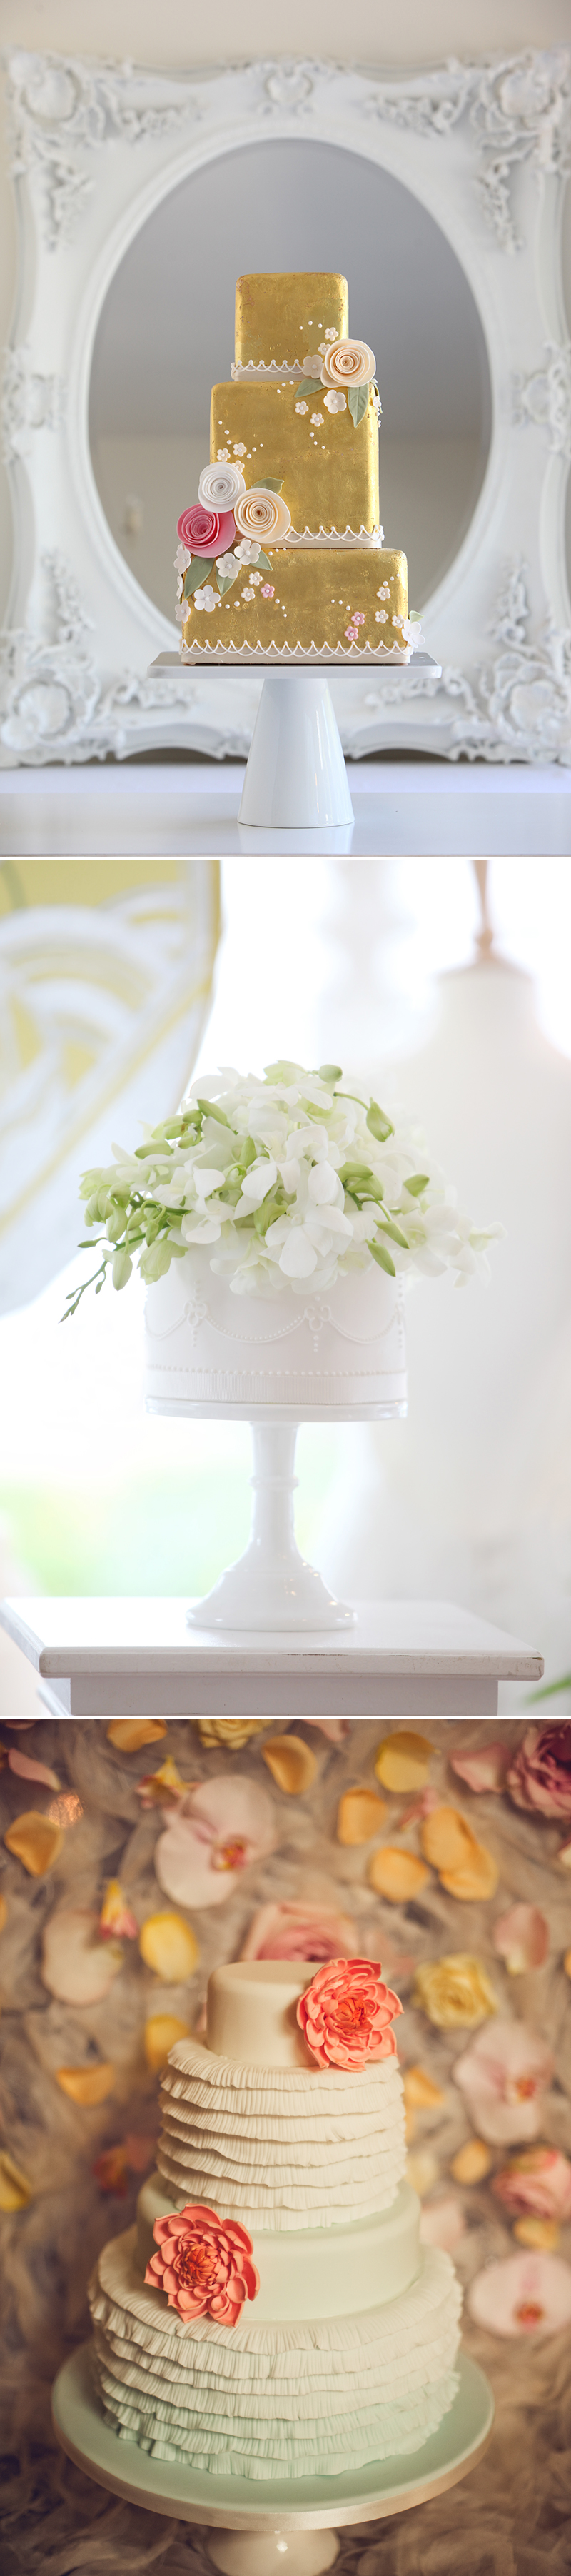 wedding-cake-inspiration-wedding-trends-2015-cake-maison-coco-wedding-venues-3